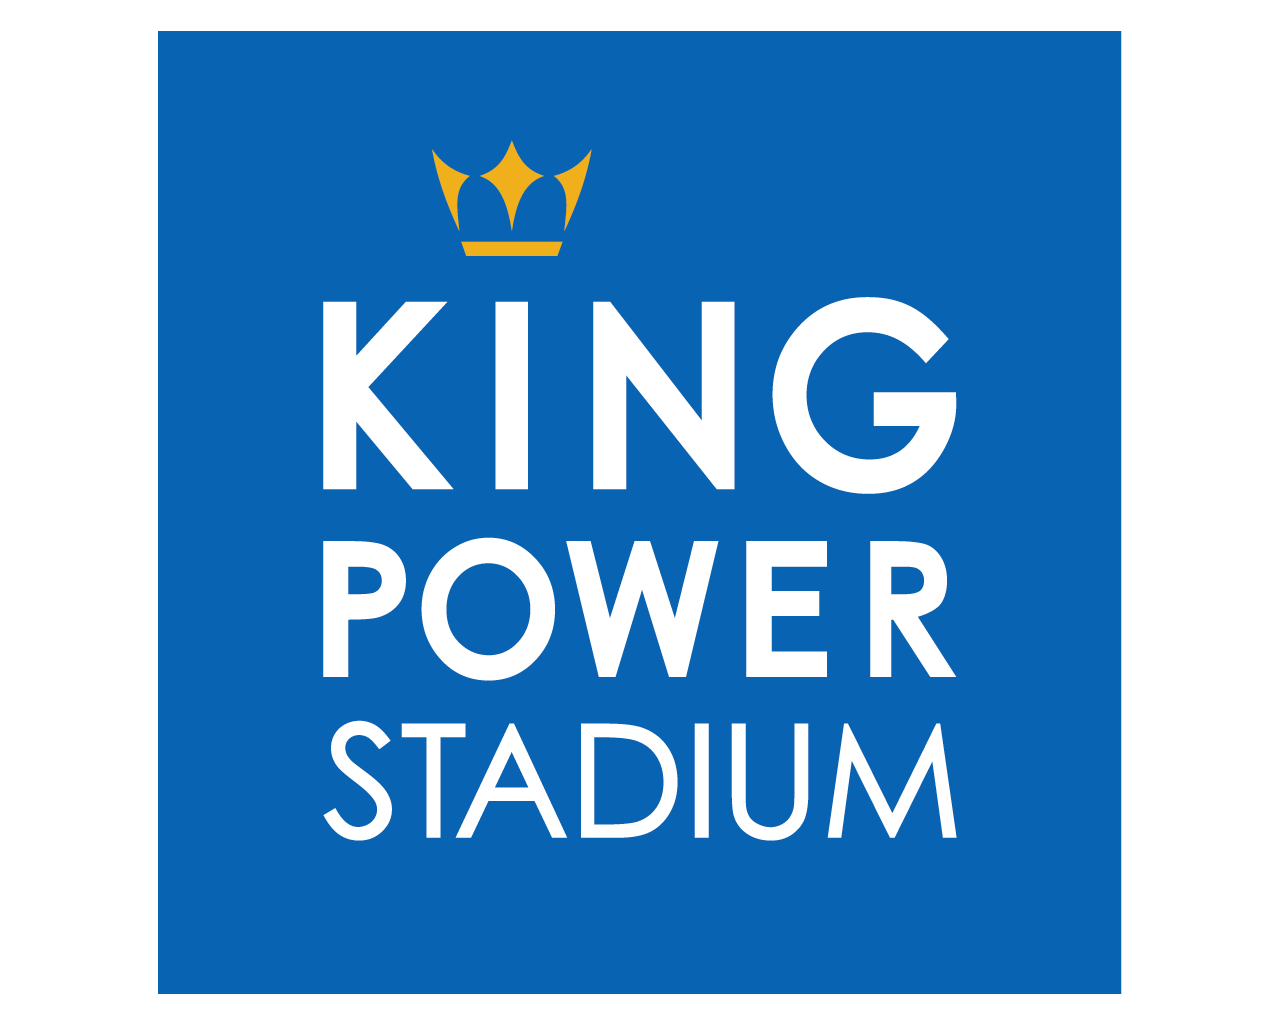 King-Power-Stadium